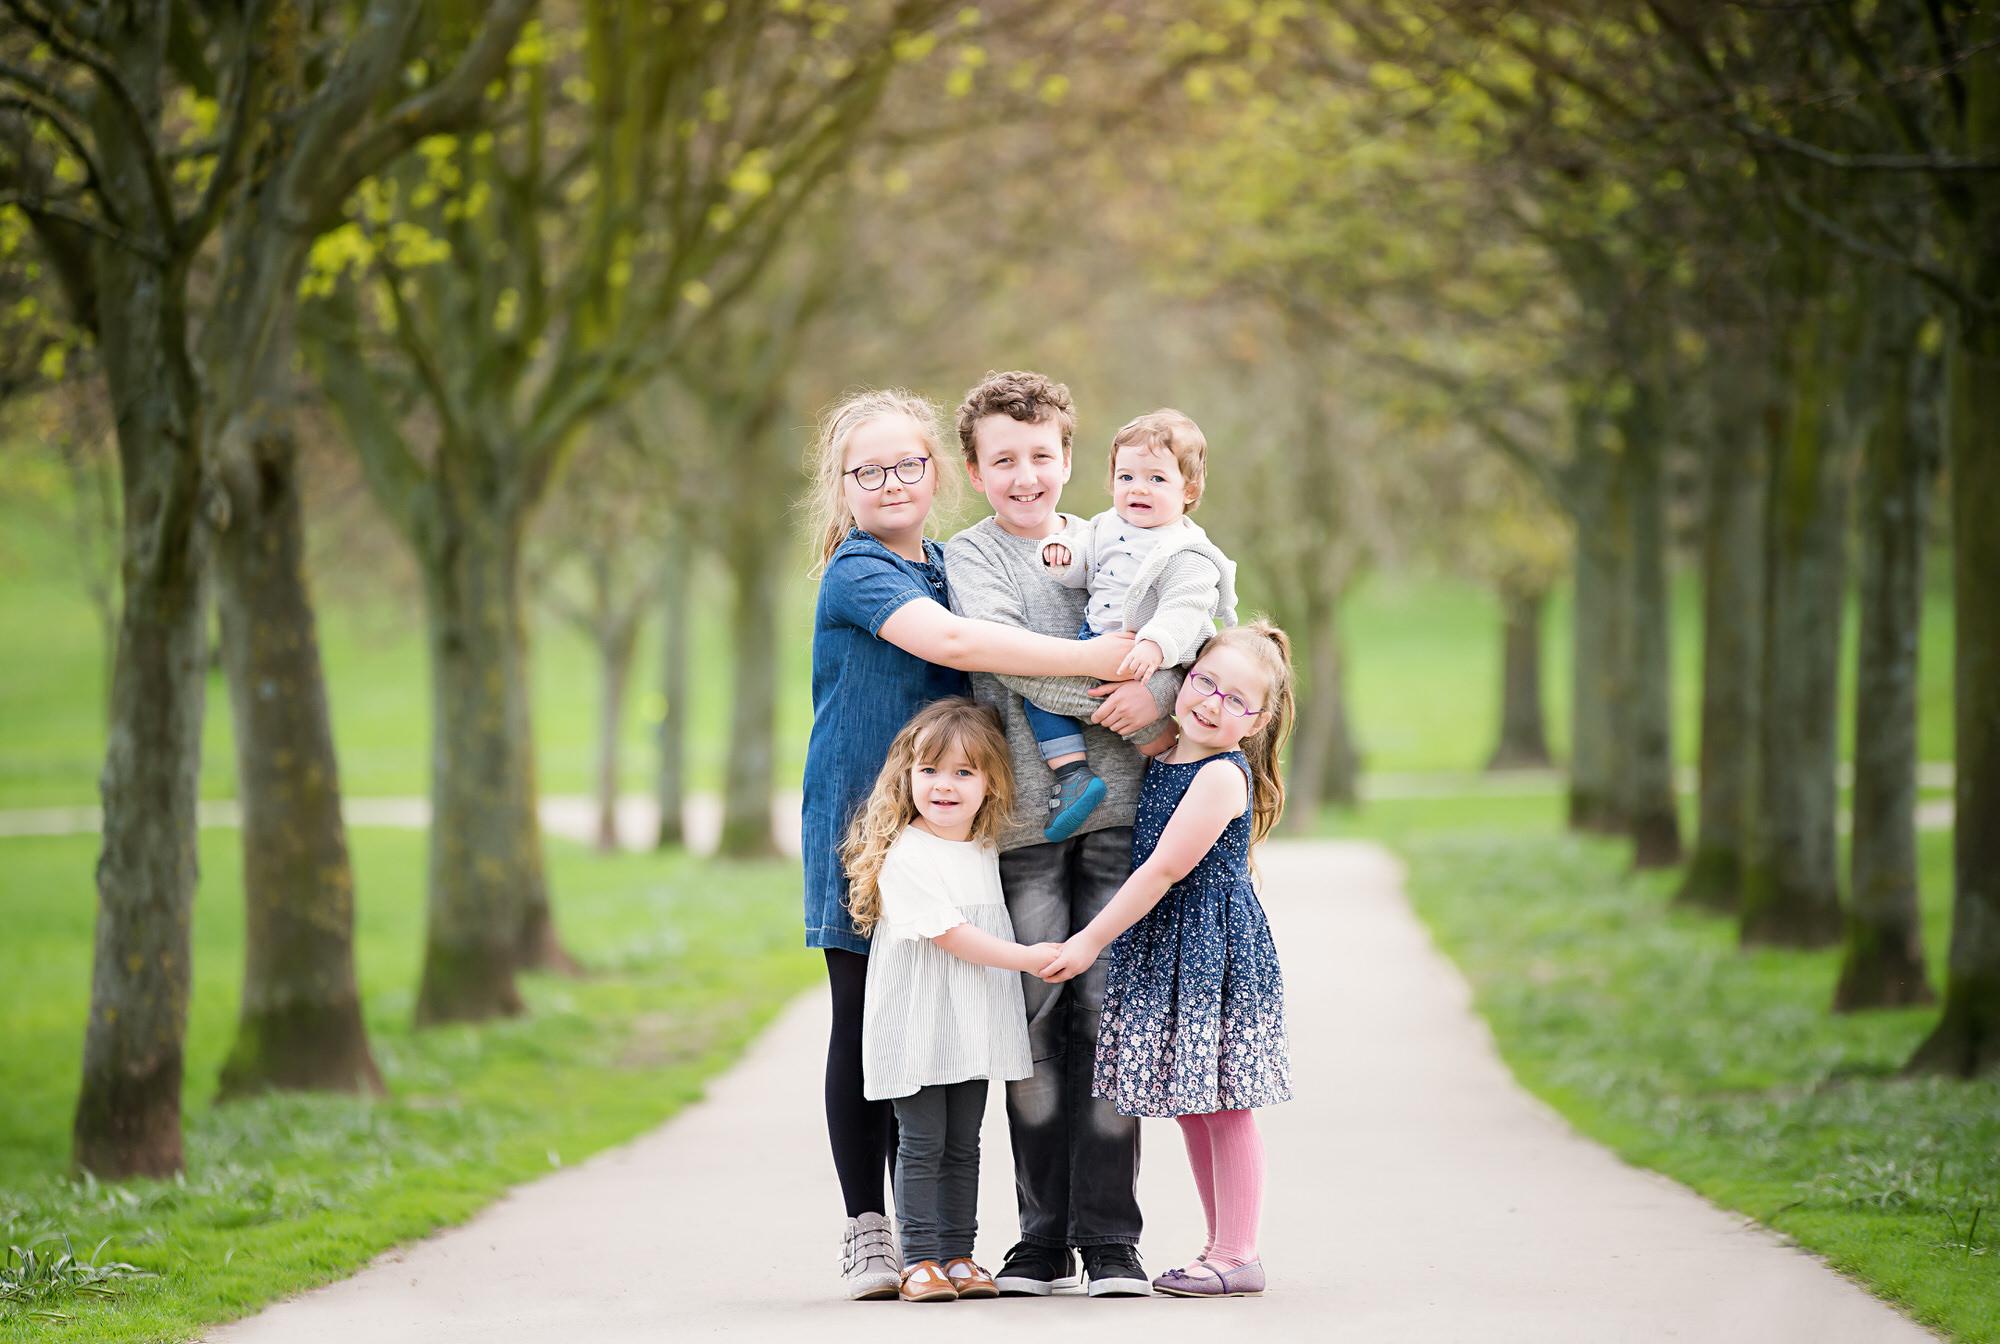 Family outdoor photoshoot, Barnsley photographer, Yorkshire